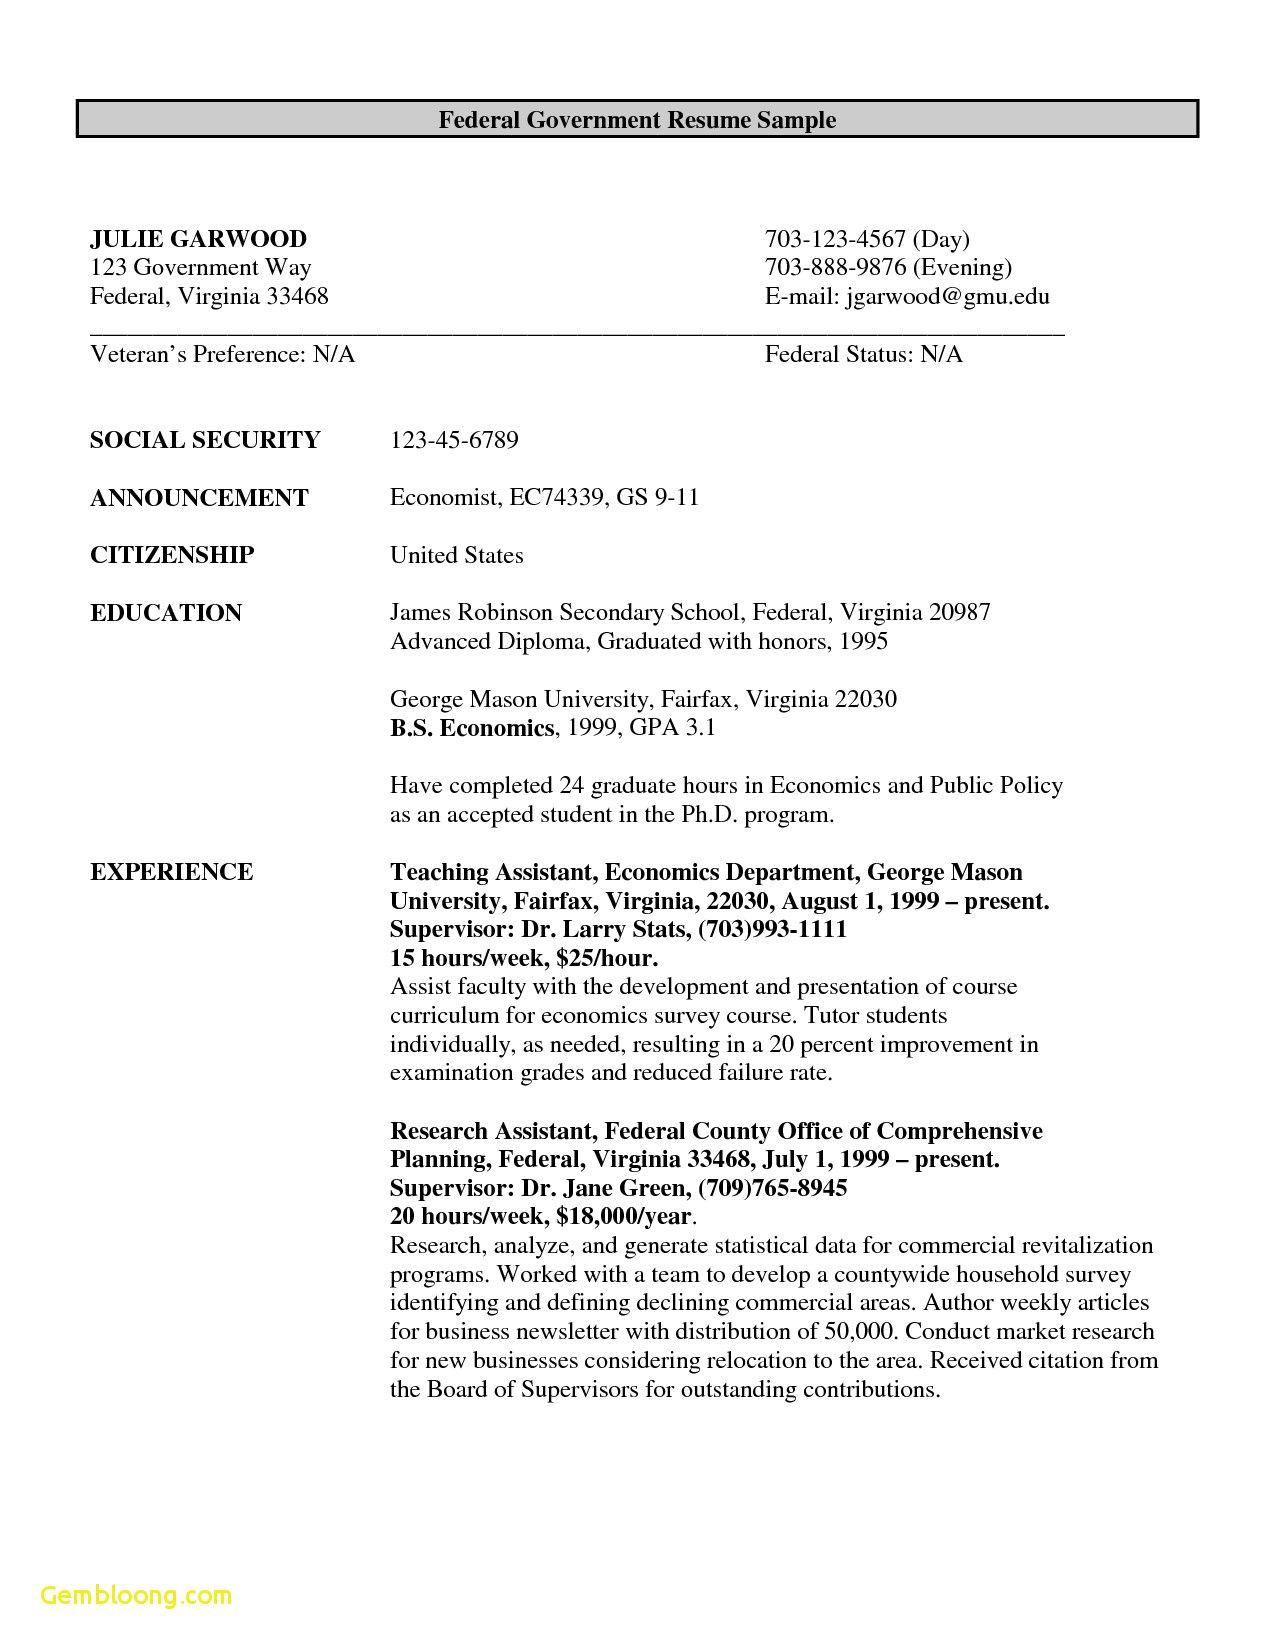 Free Resume Templates Government freeresumetemplates